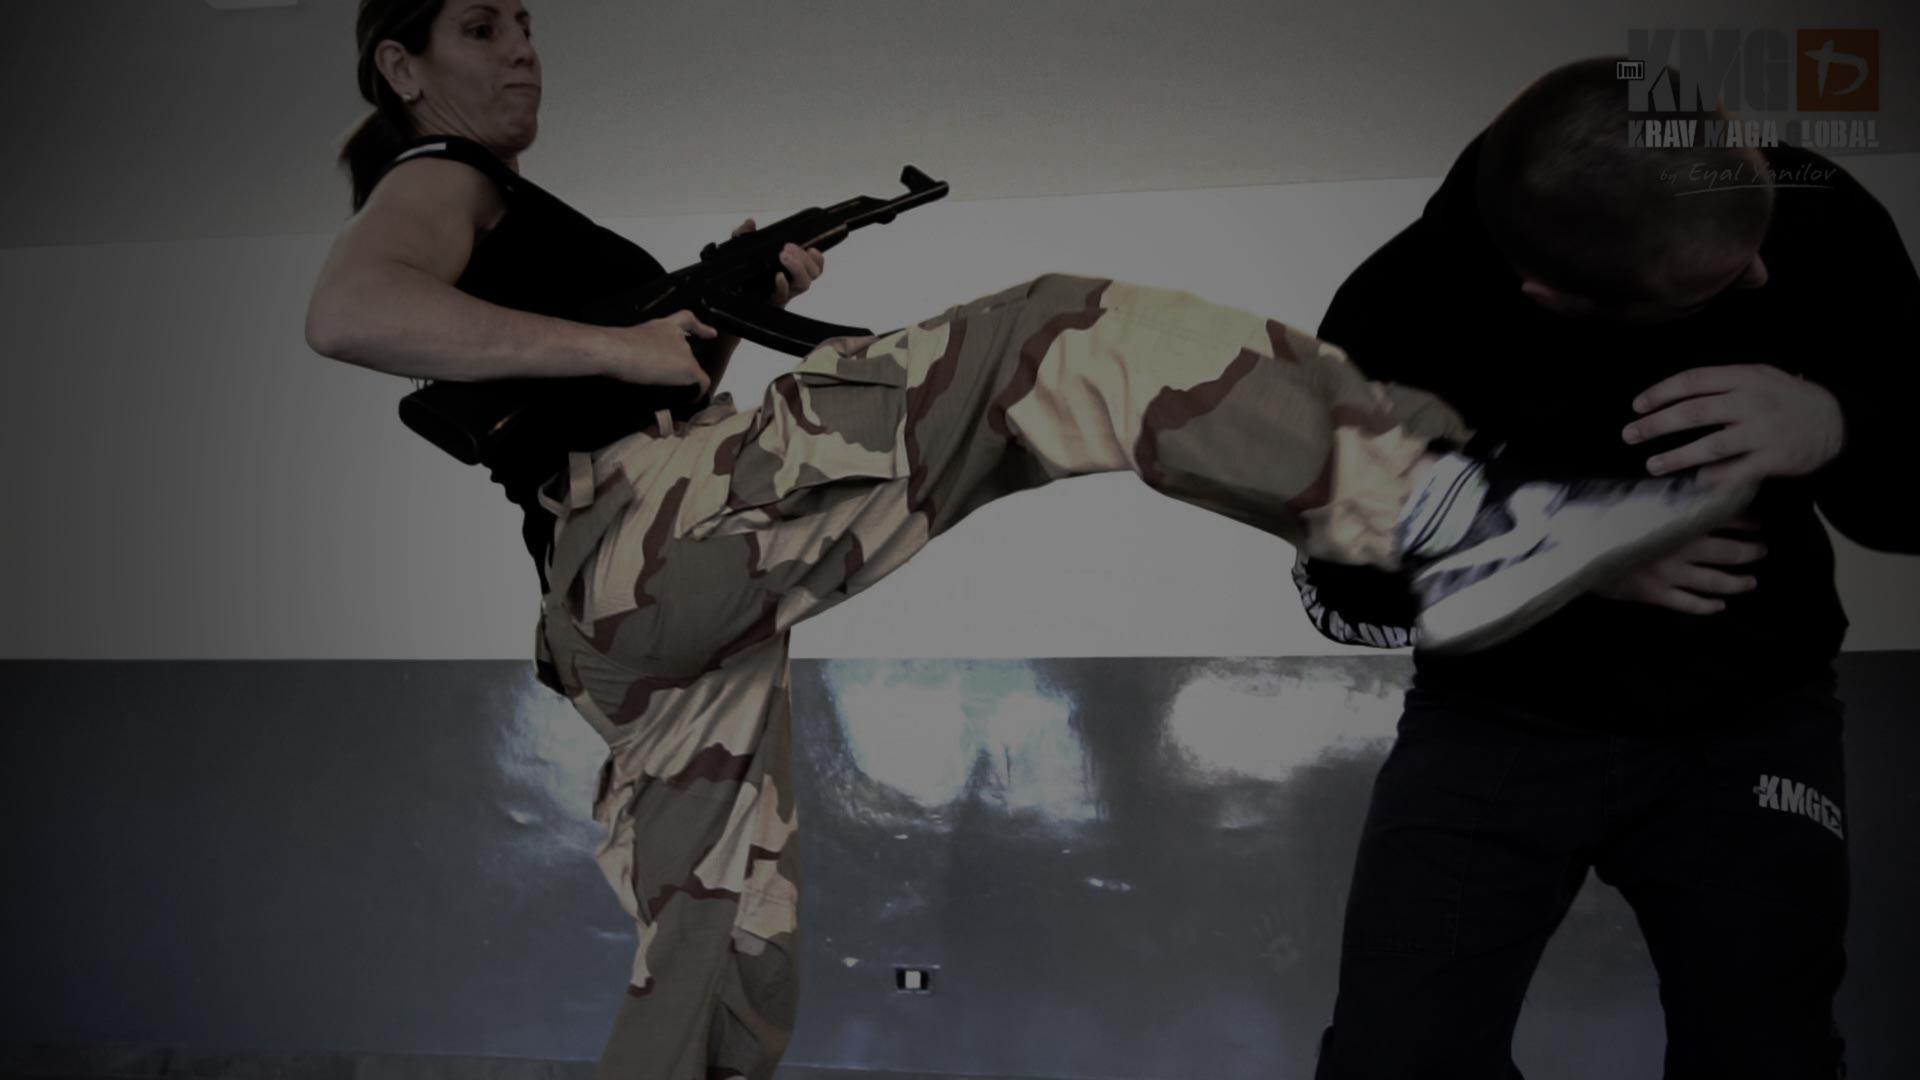 KMG Argentina – Defensa real para situaciones reales